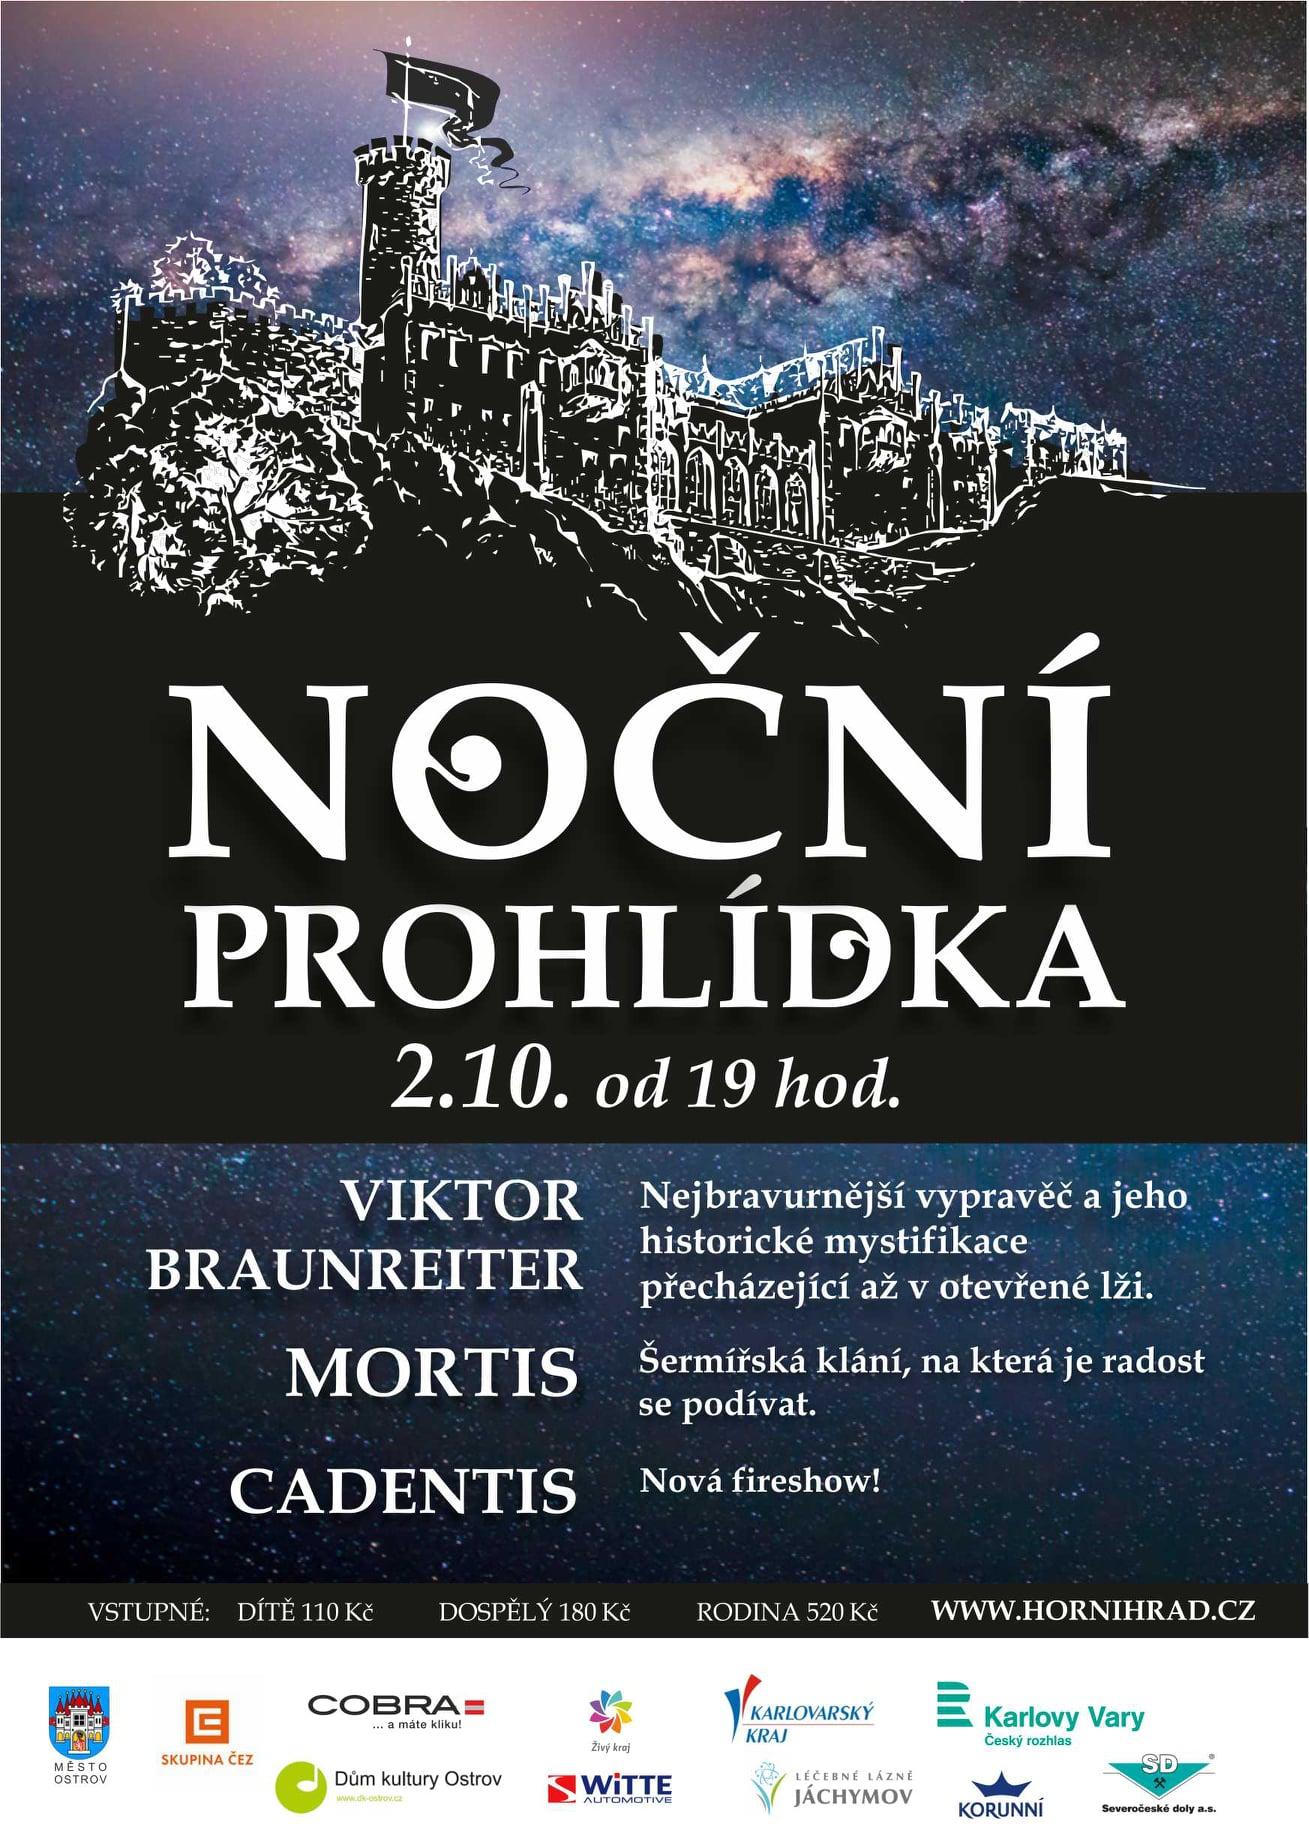 horni-hrad-nocni-prohlidka-rijen-2021